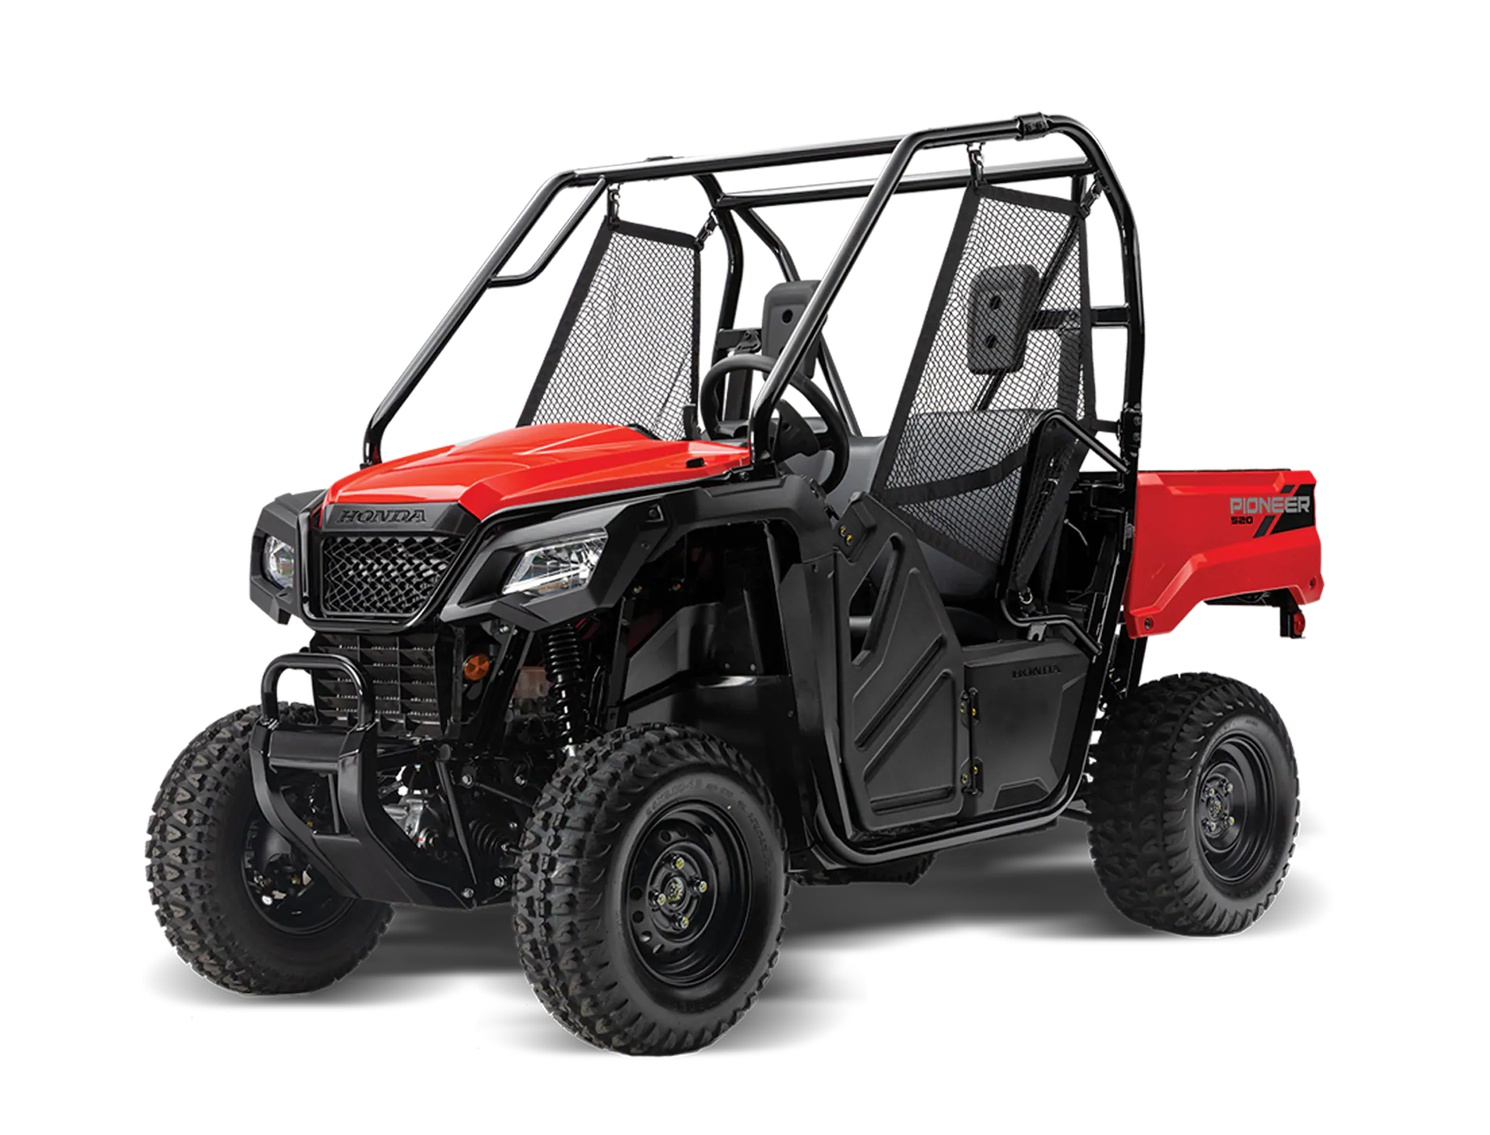 2021 Honda Pioneer 520 Frais inclus+Taxes